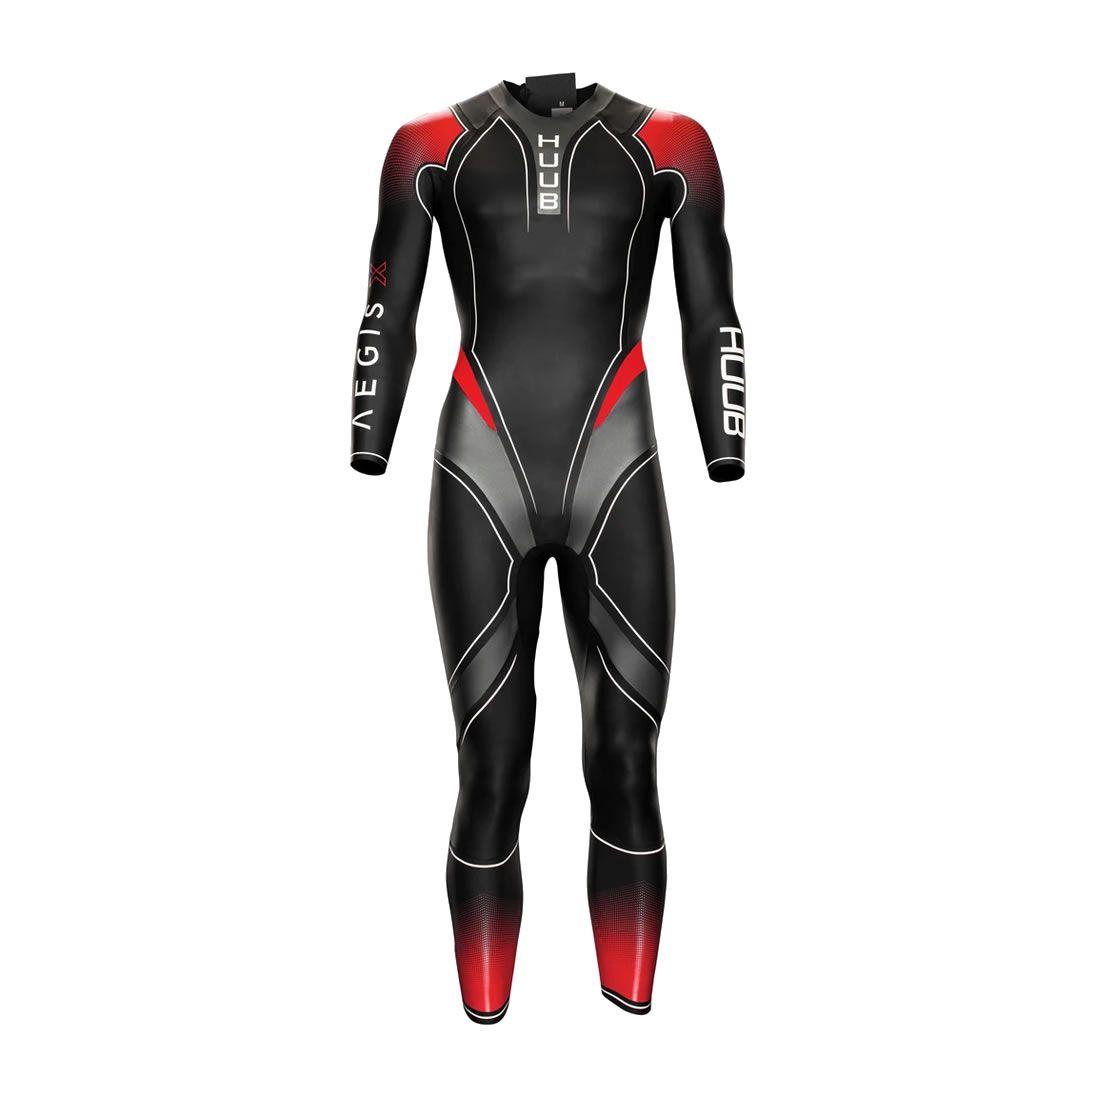 HUUB AEGIS X 3:5 Triathlon Neoprenanzug Herren - Schwmm Neo Openwater